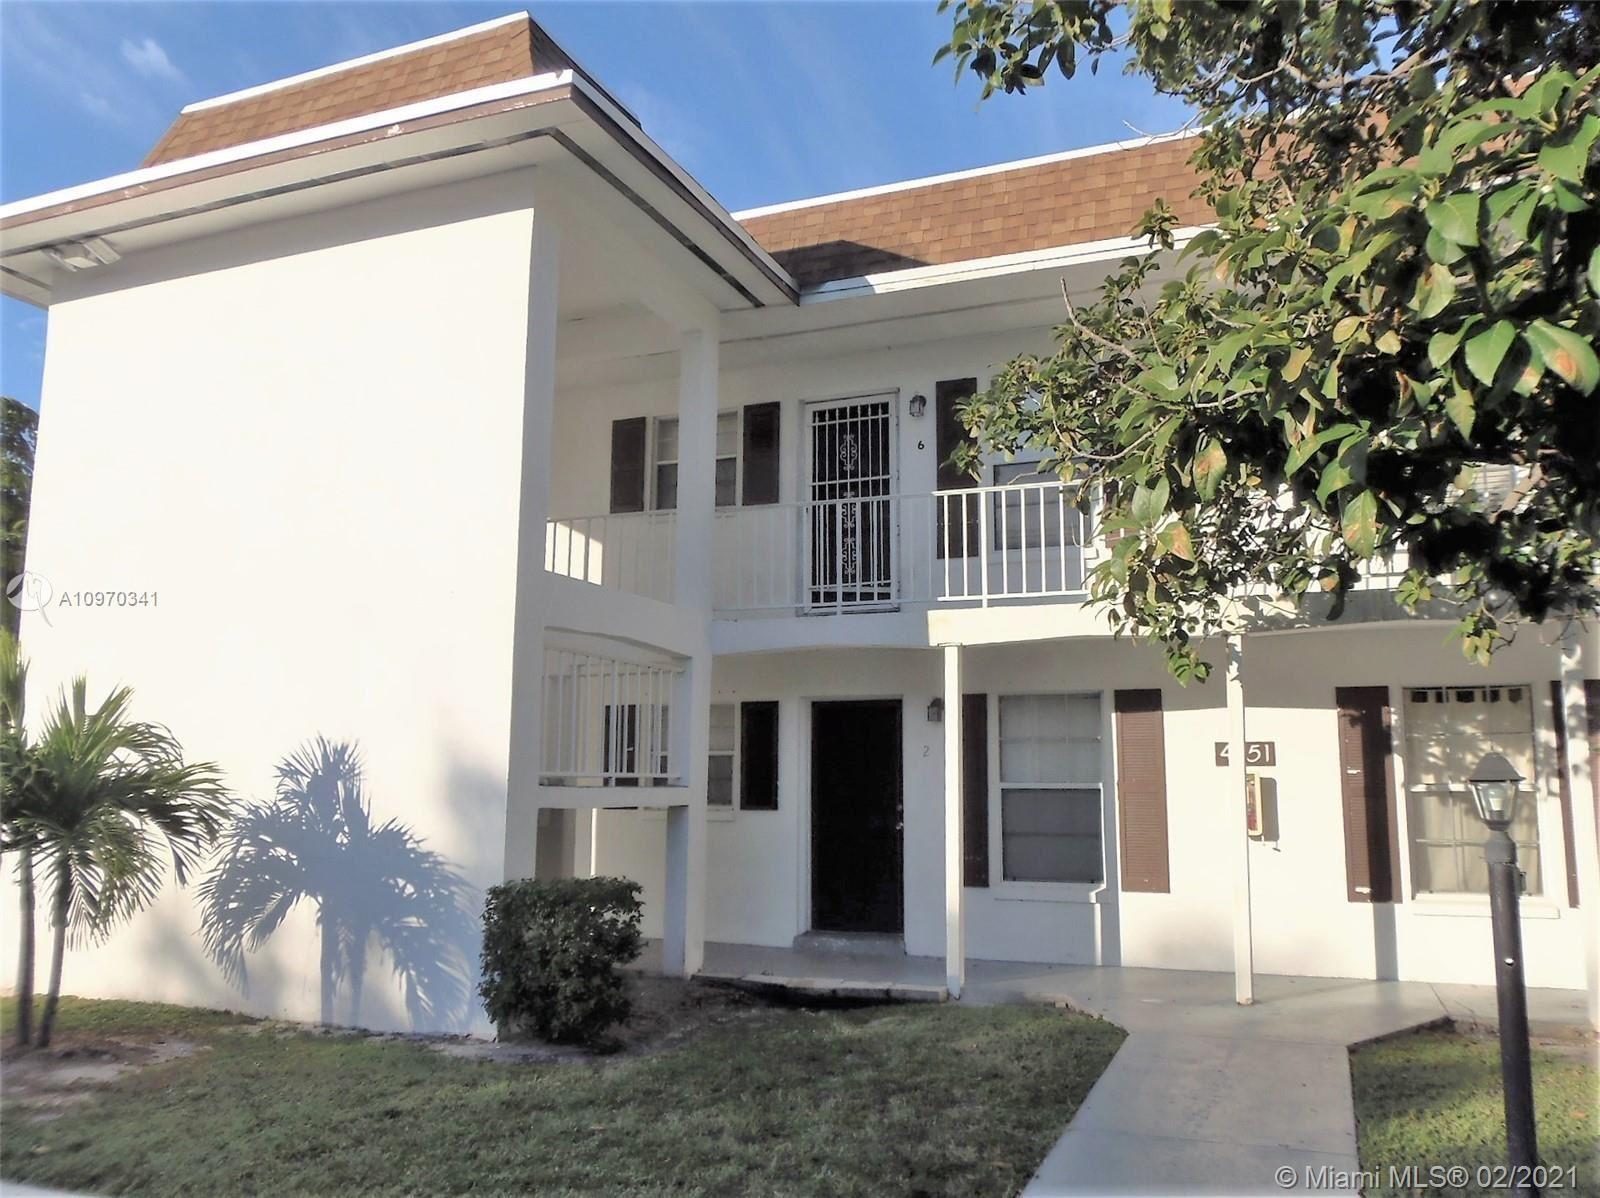 4951 Wedgewood Way #6, West Palm Beach, FL 33417 - #: A10970341